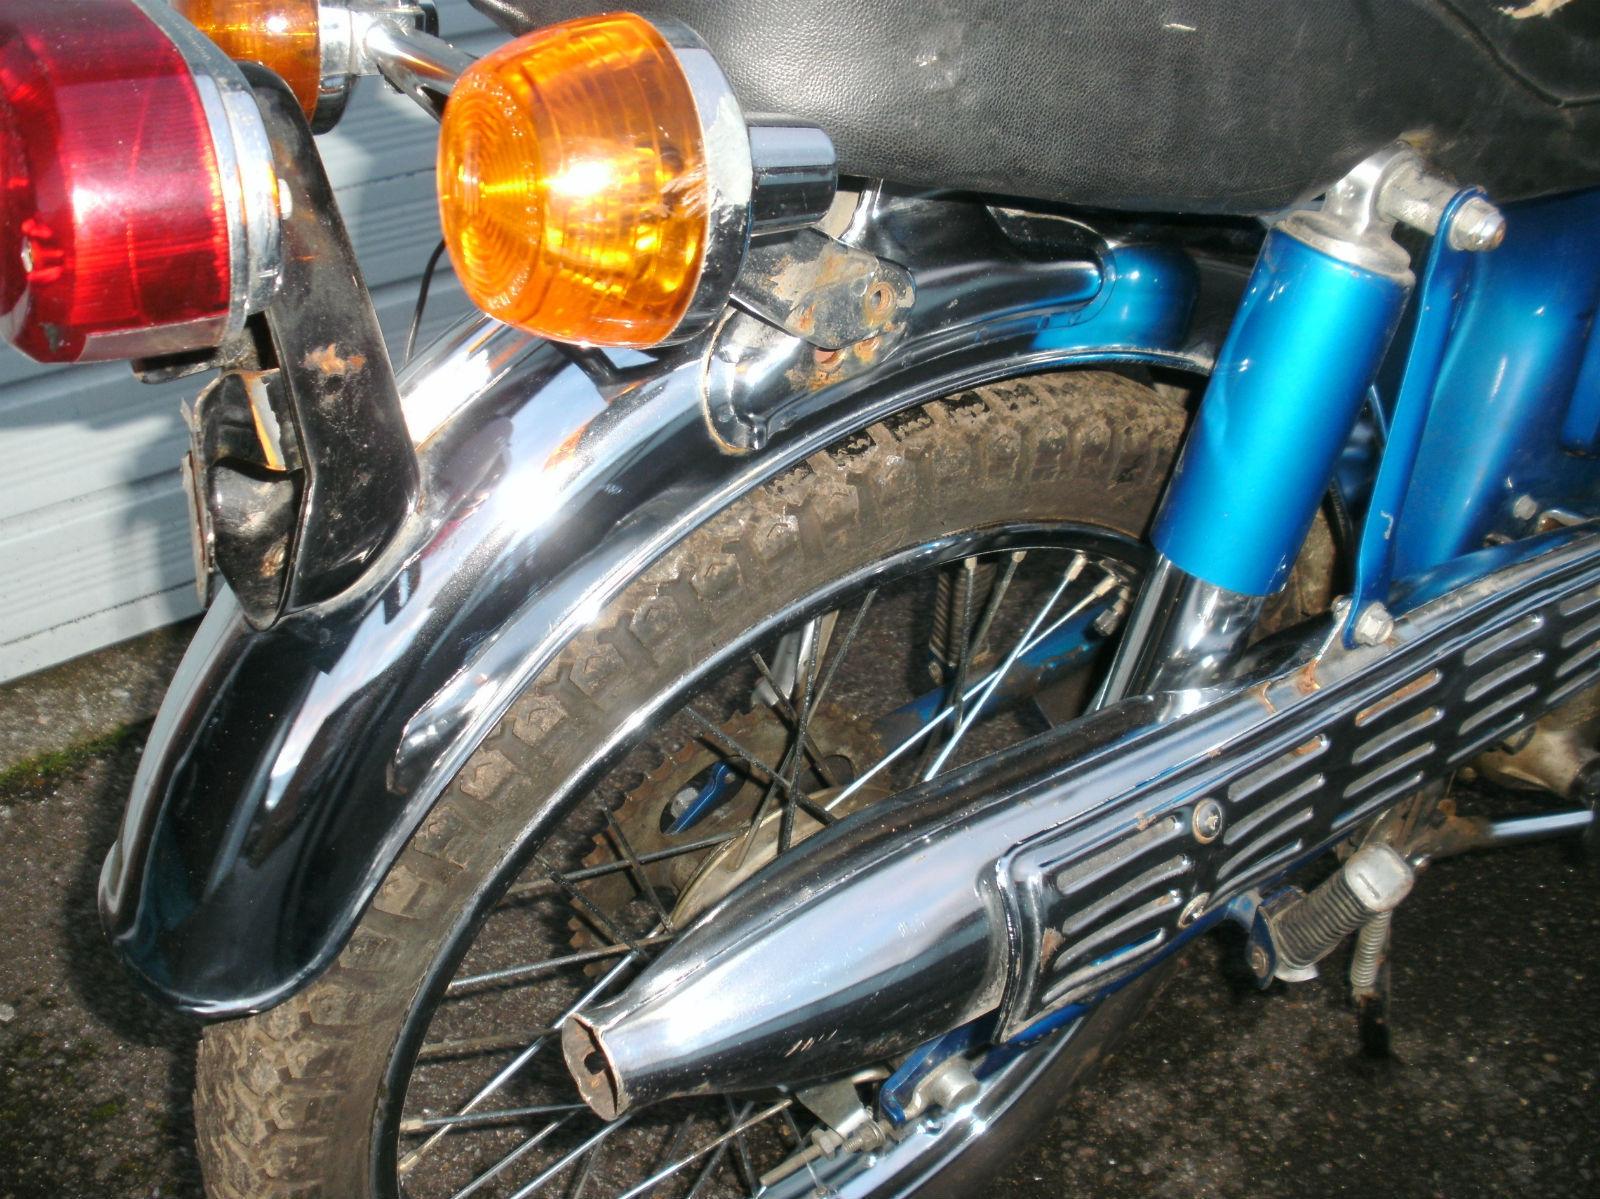 Kellly Blue Book Antique Honda Motorcycle 28